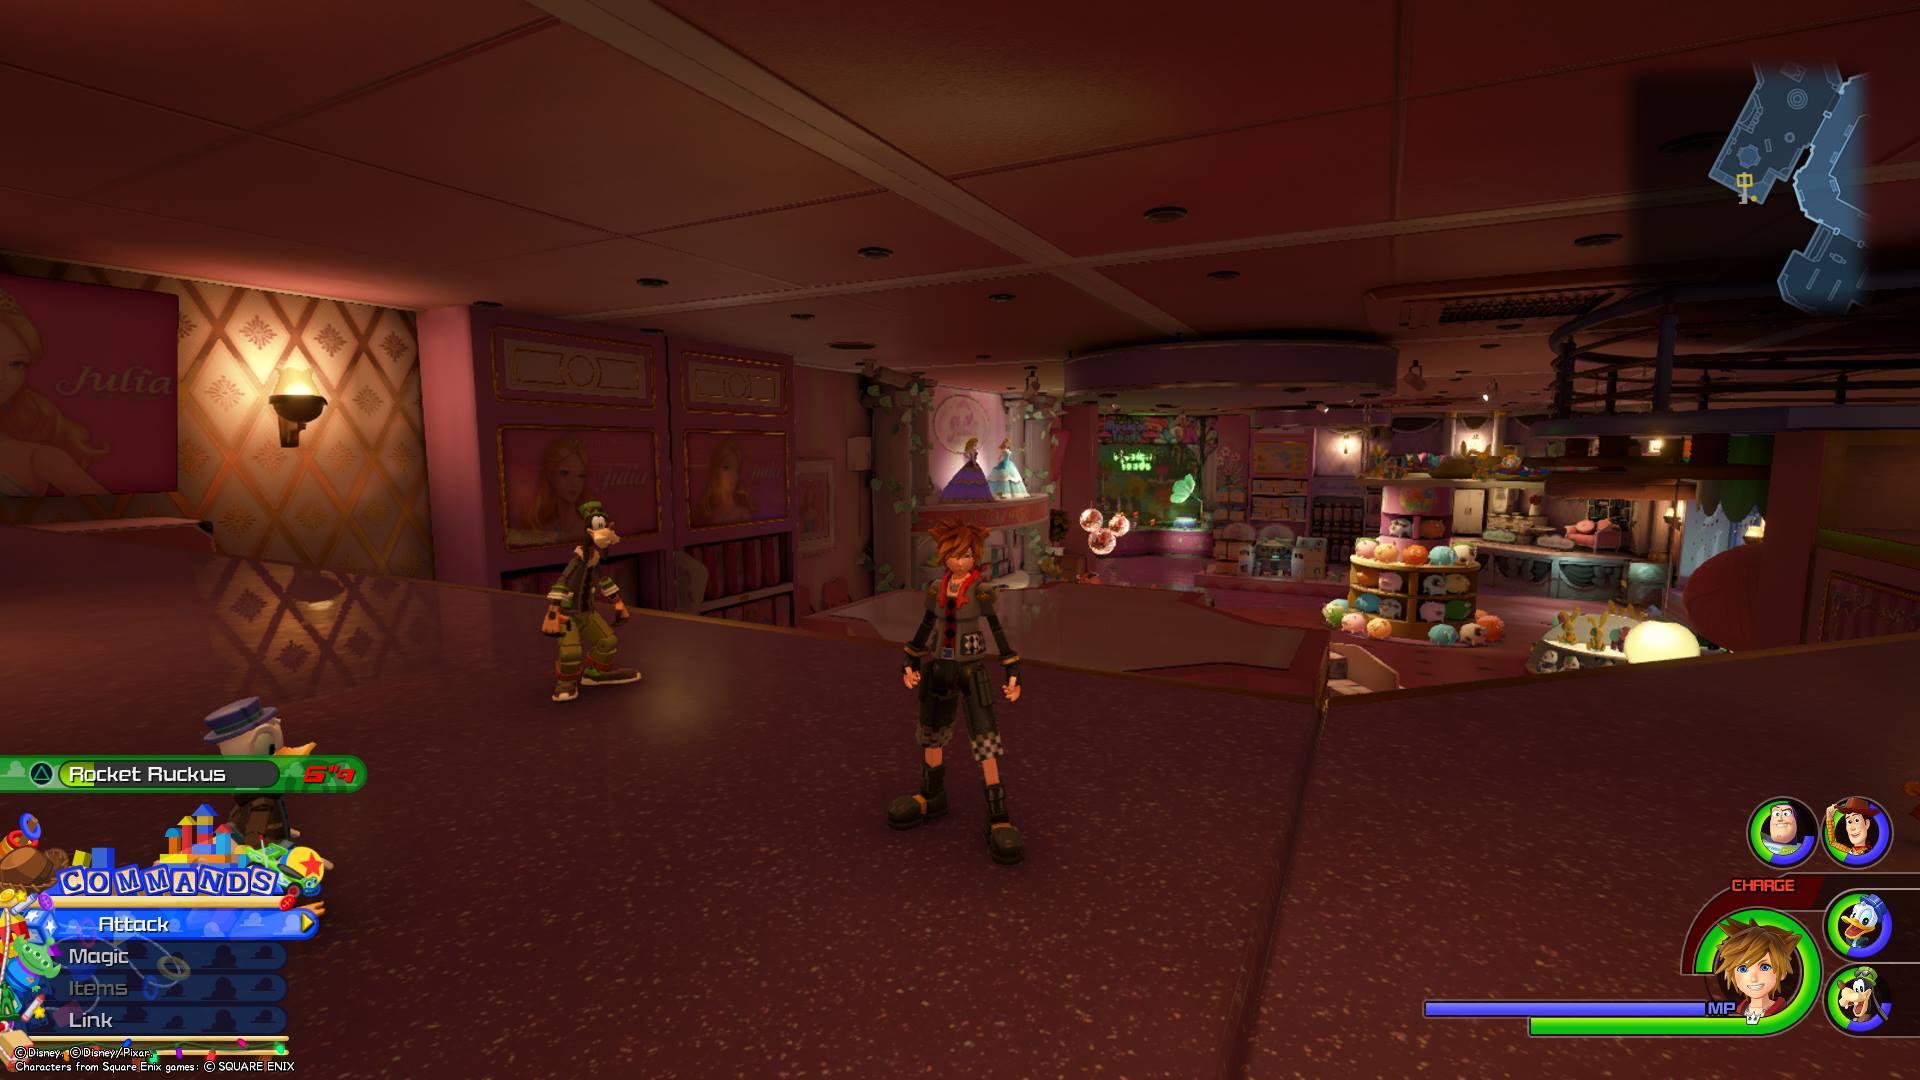 Kingdom Hearts 3 - Toy Box Lucky Emblem 11